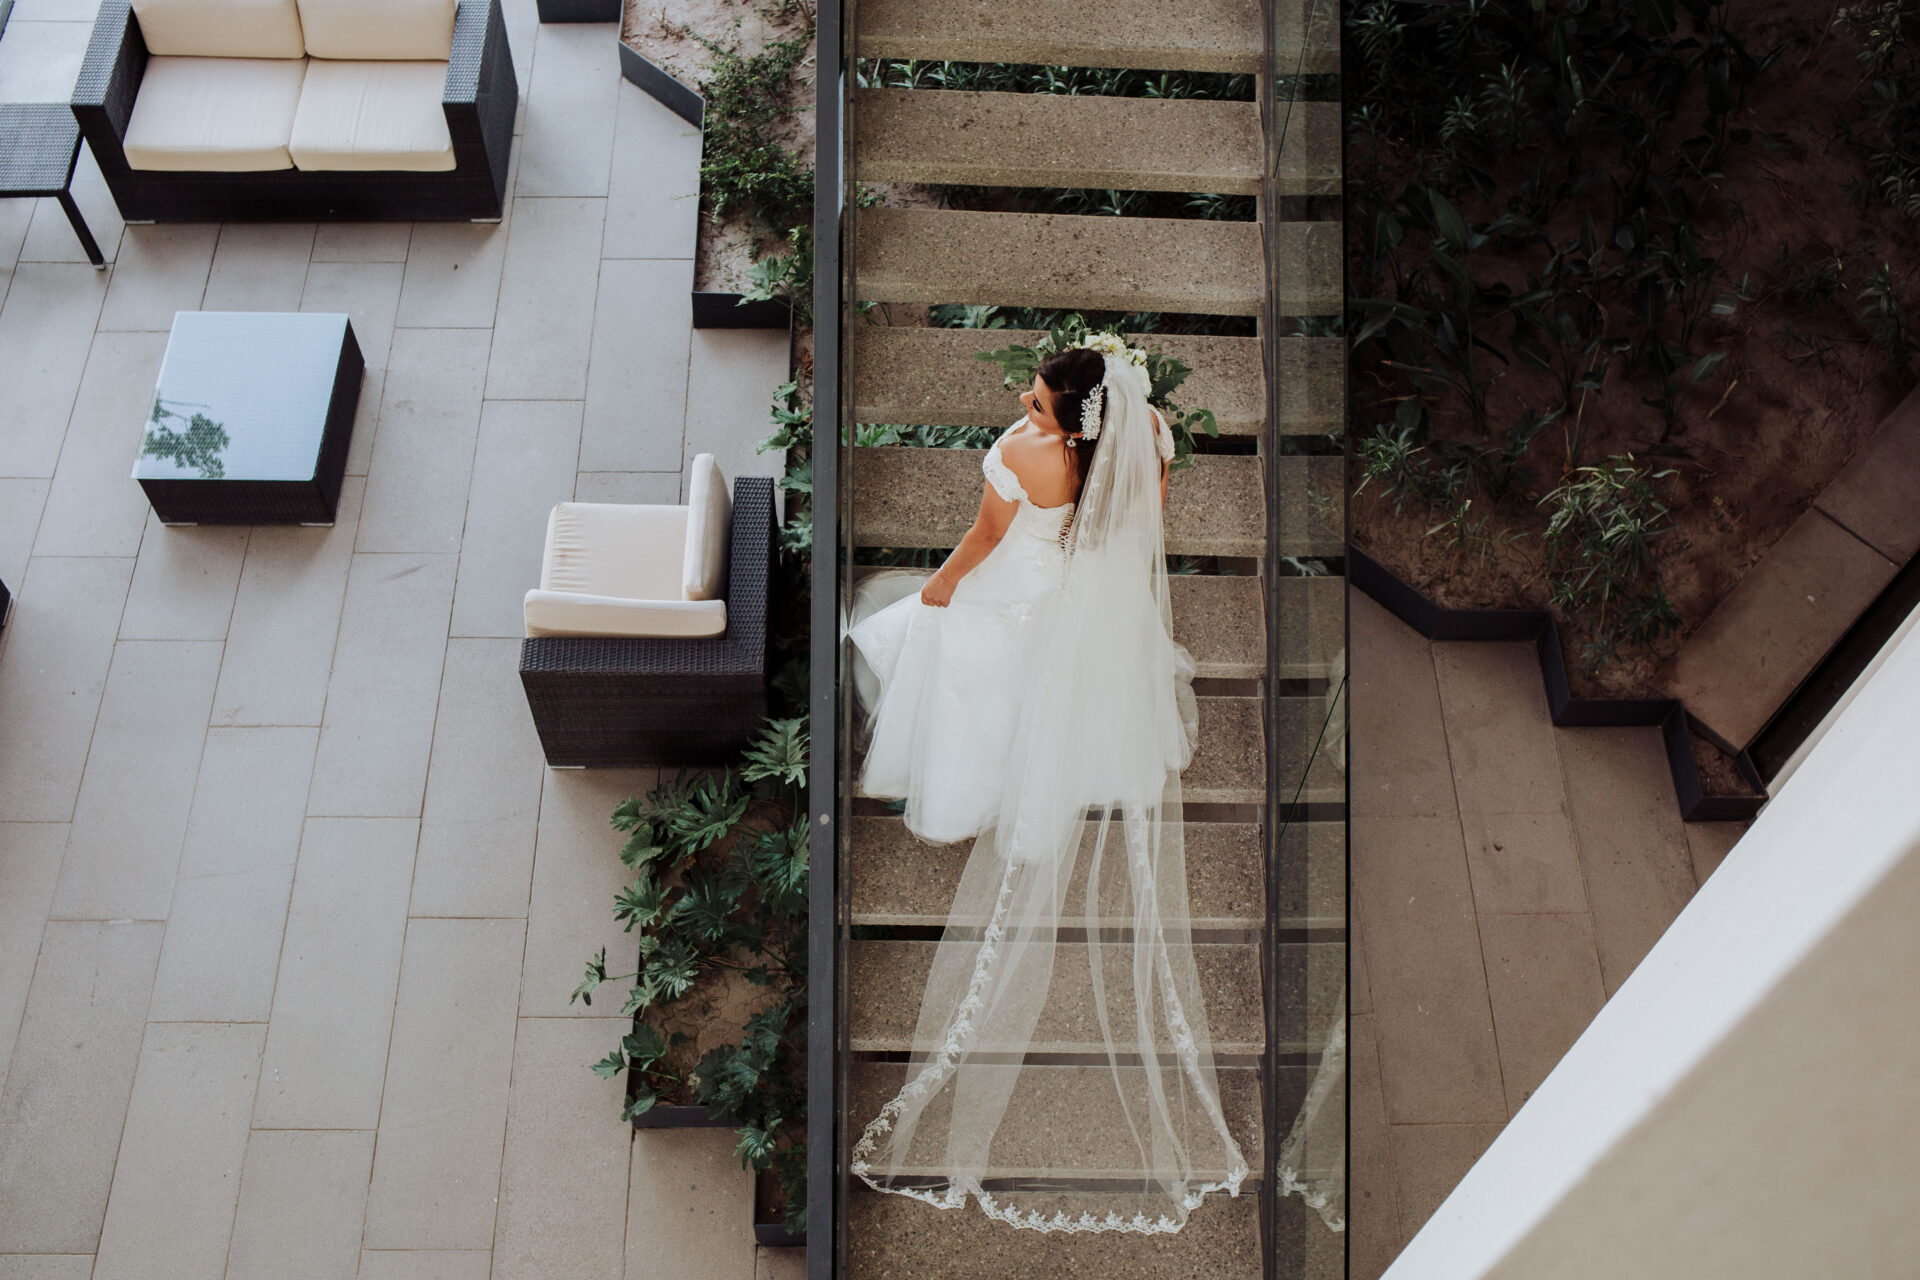 javier_noriega_fotografo_bodas_torreon_coahuila_zacatecas_wedding_photographer22a